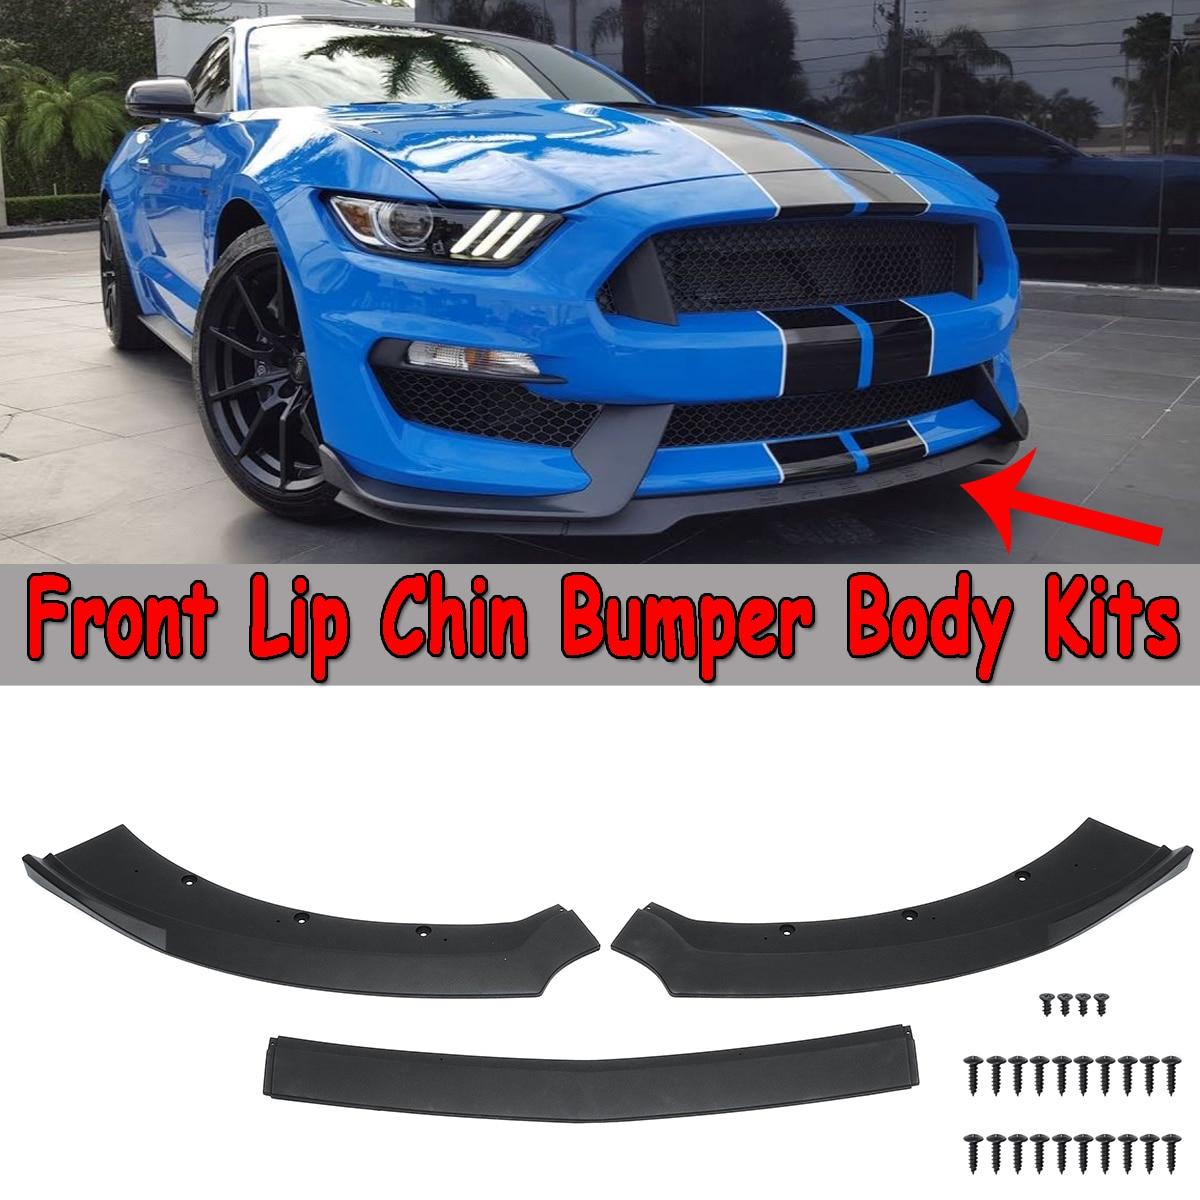 Nova 3 Pcs Preto Frente Car Bumper Lip Spoiler Divisores Difusor Kits Corpo Protetor Para Ford Mustang 2015 2016 2017